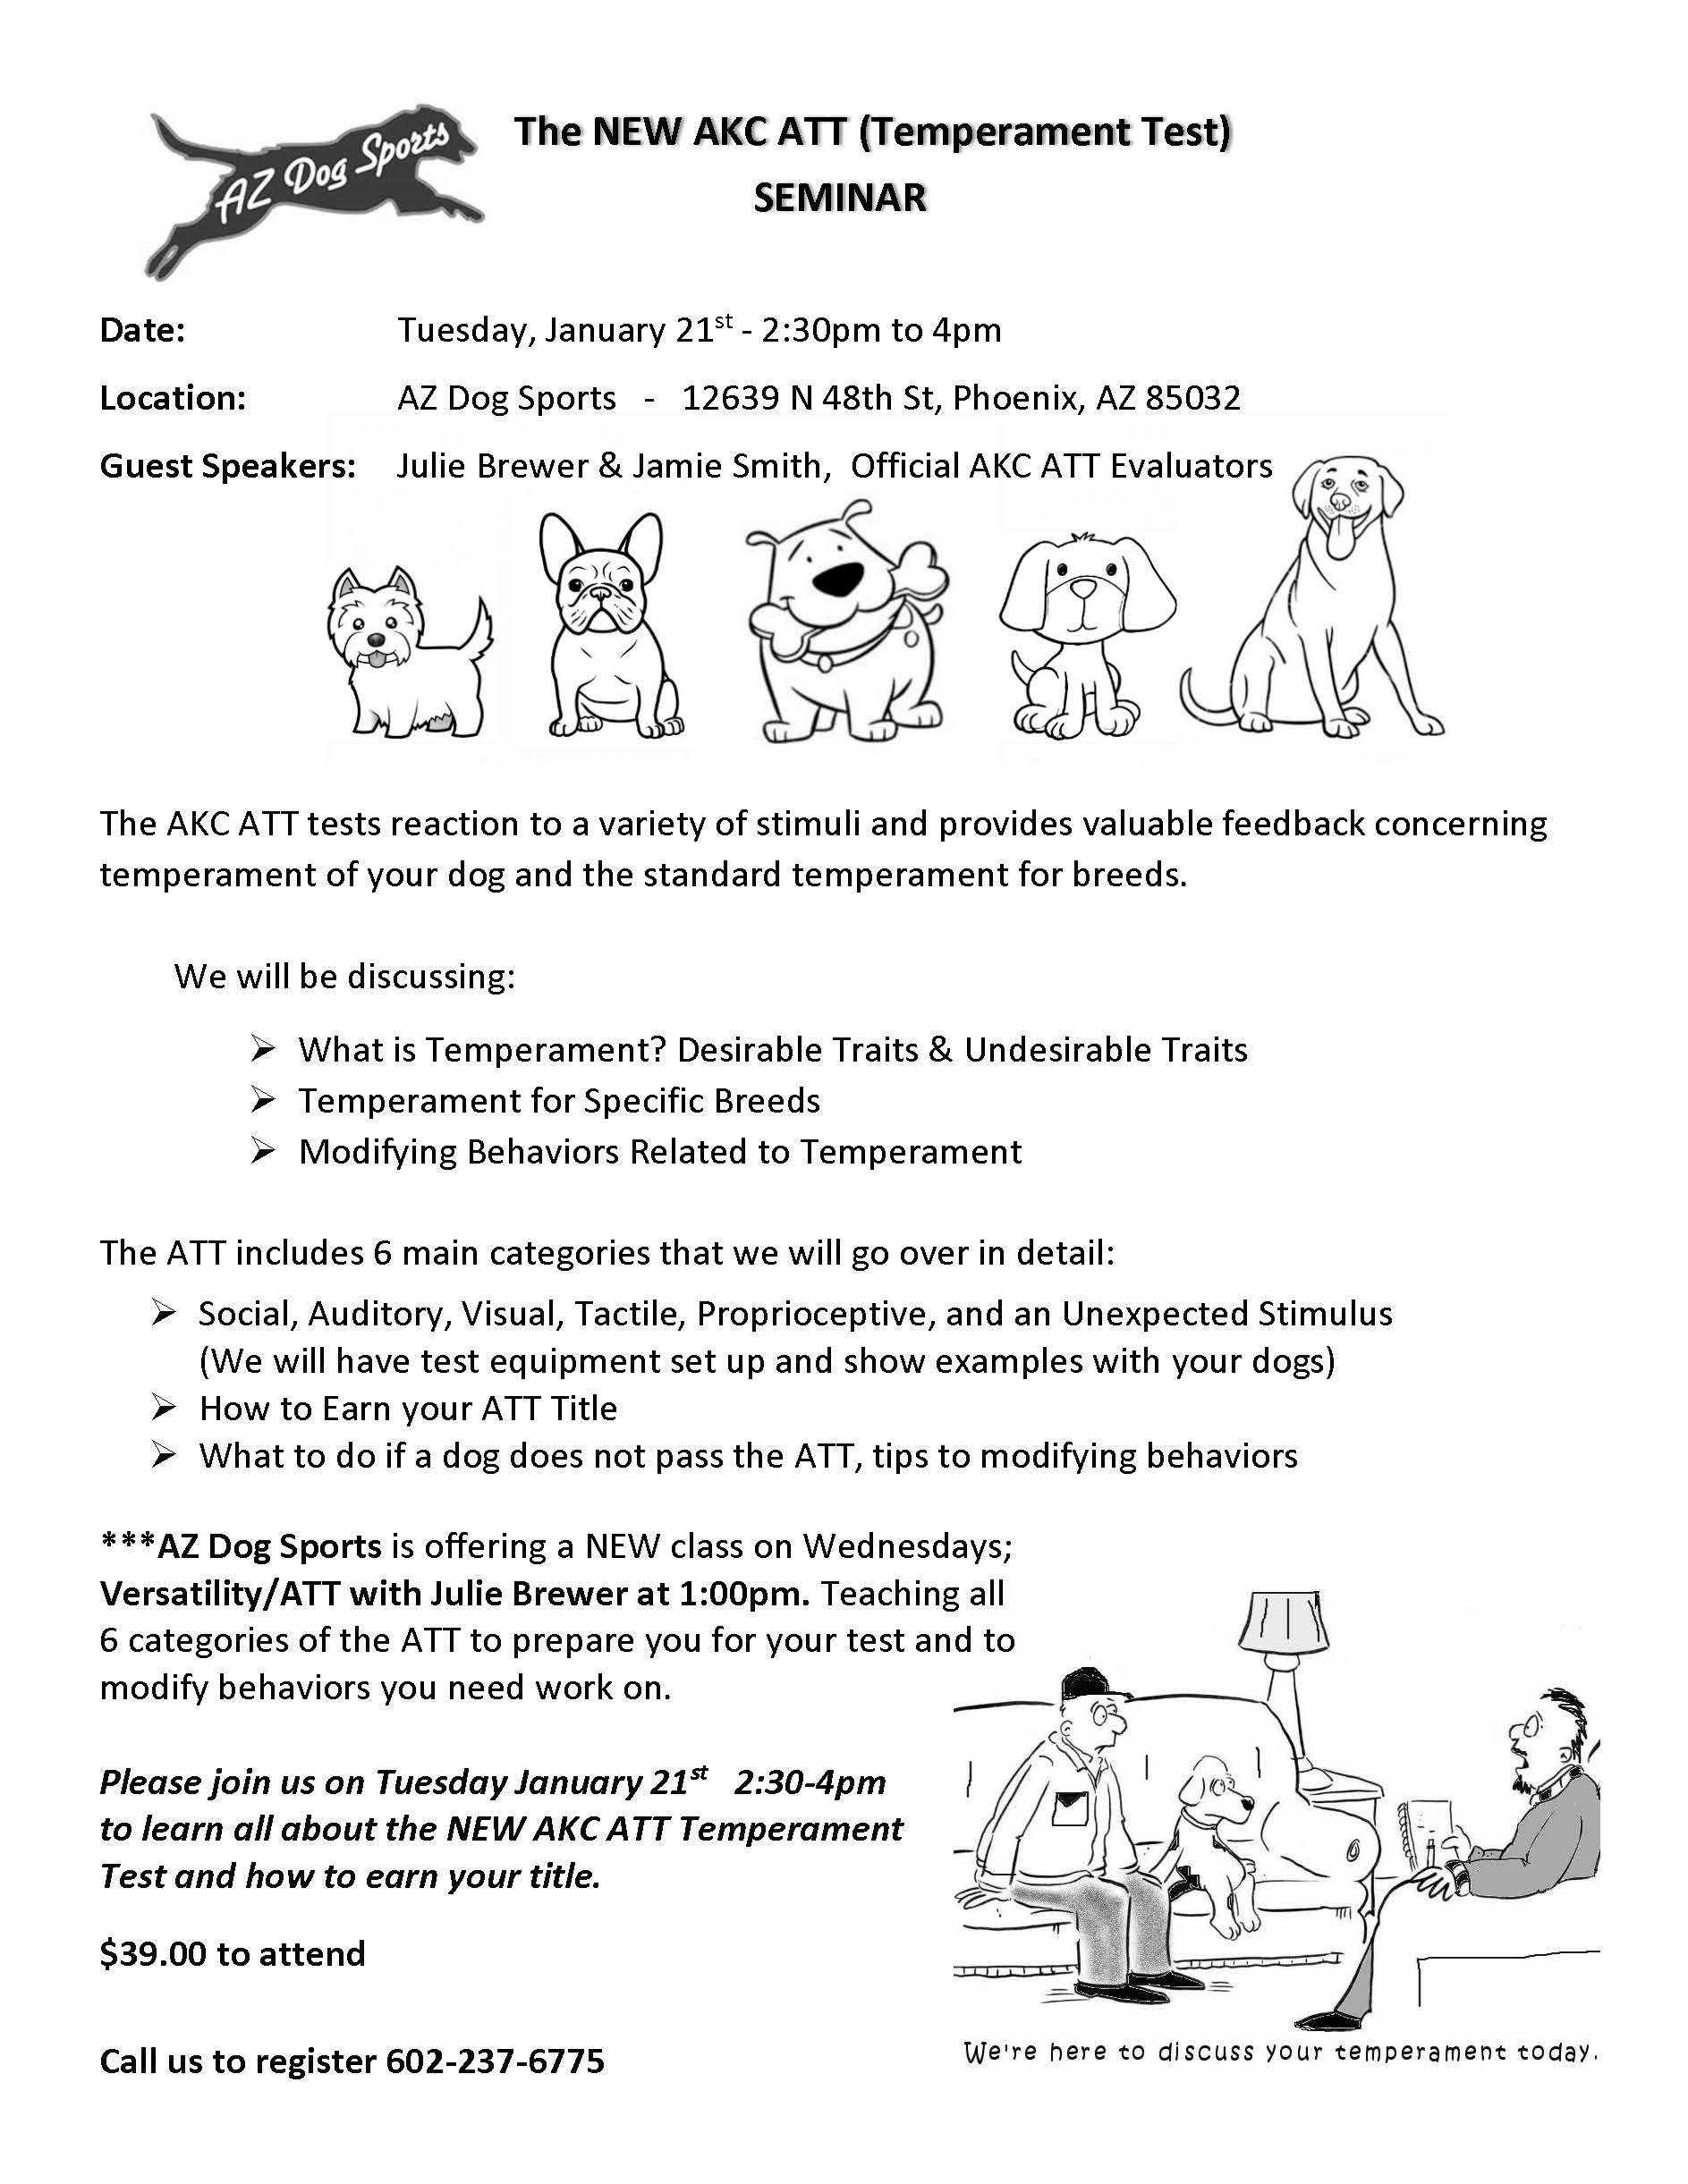 AKC ATT, temperament test, julie brewer, az dog sports, dog training